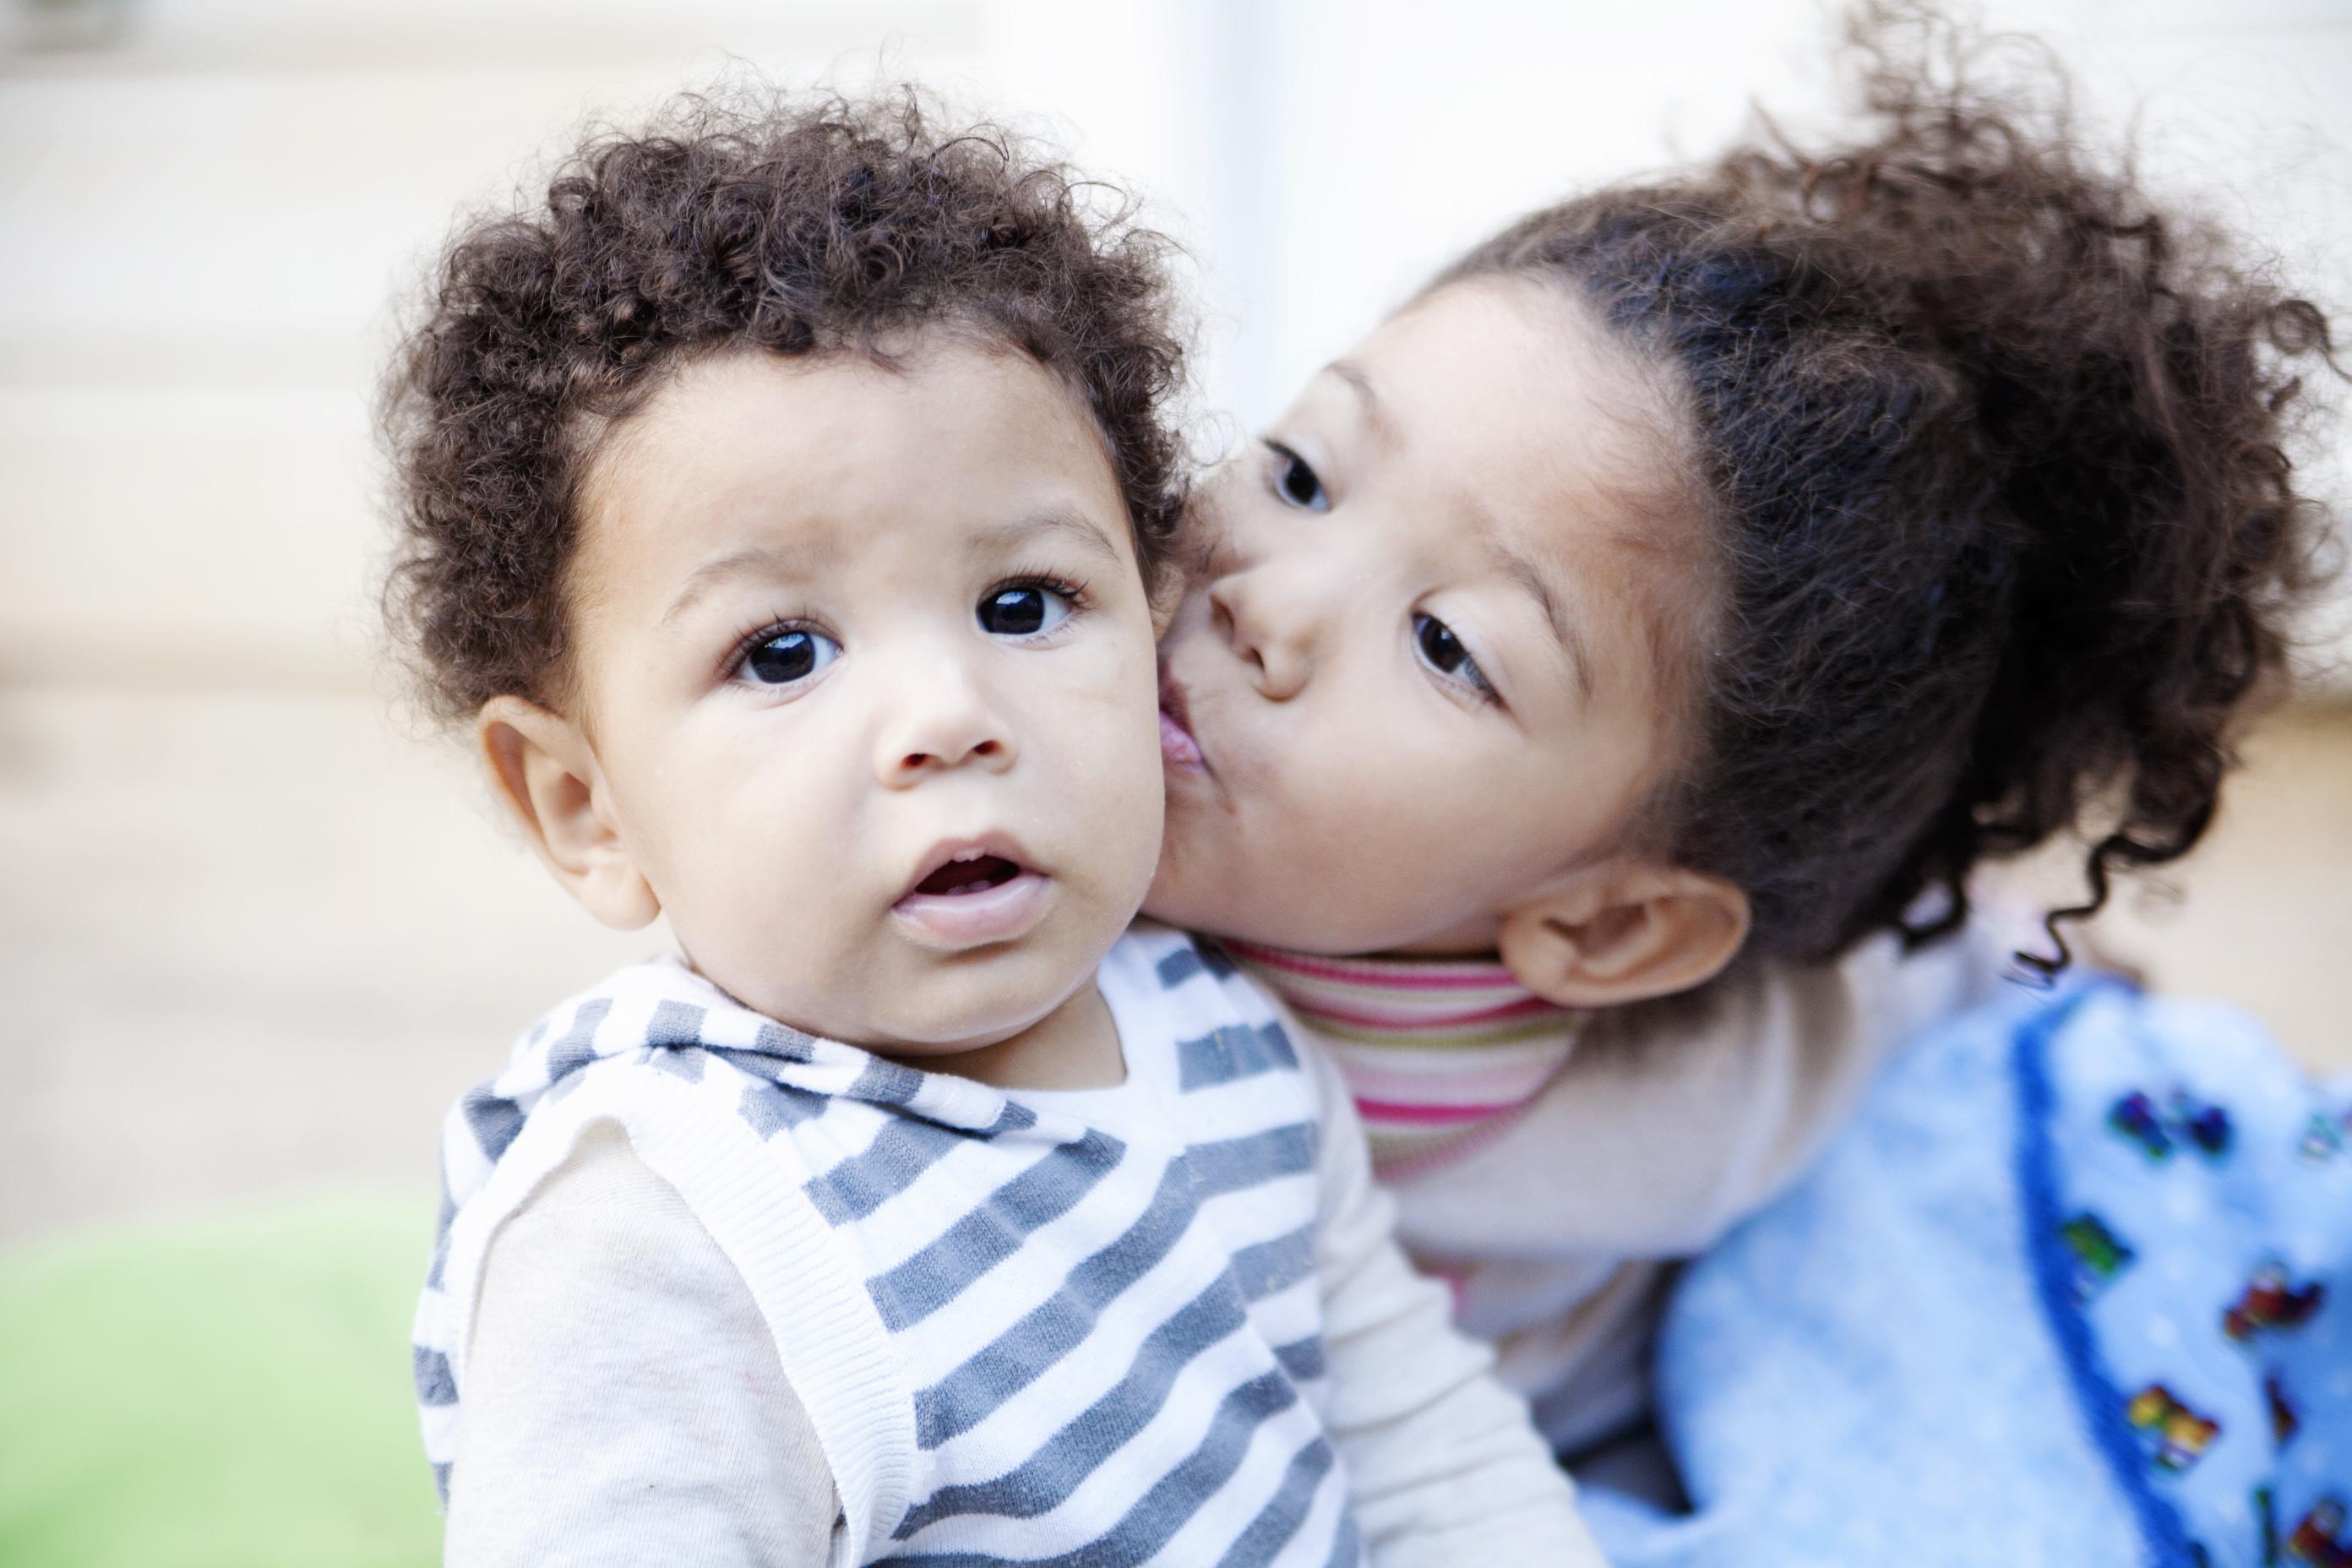 Interracial baby making